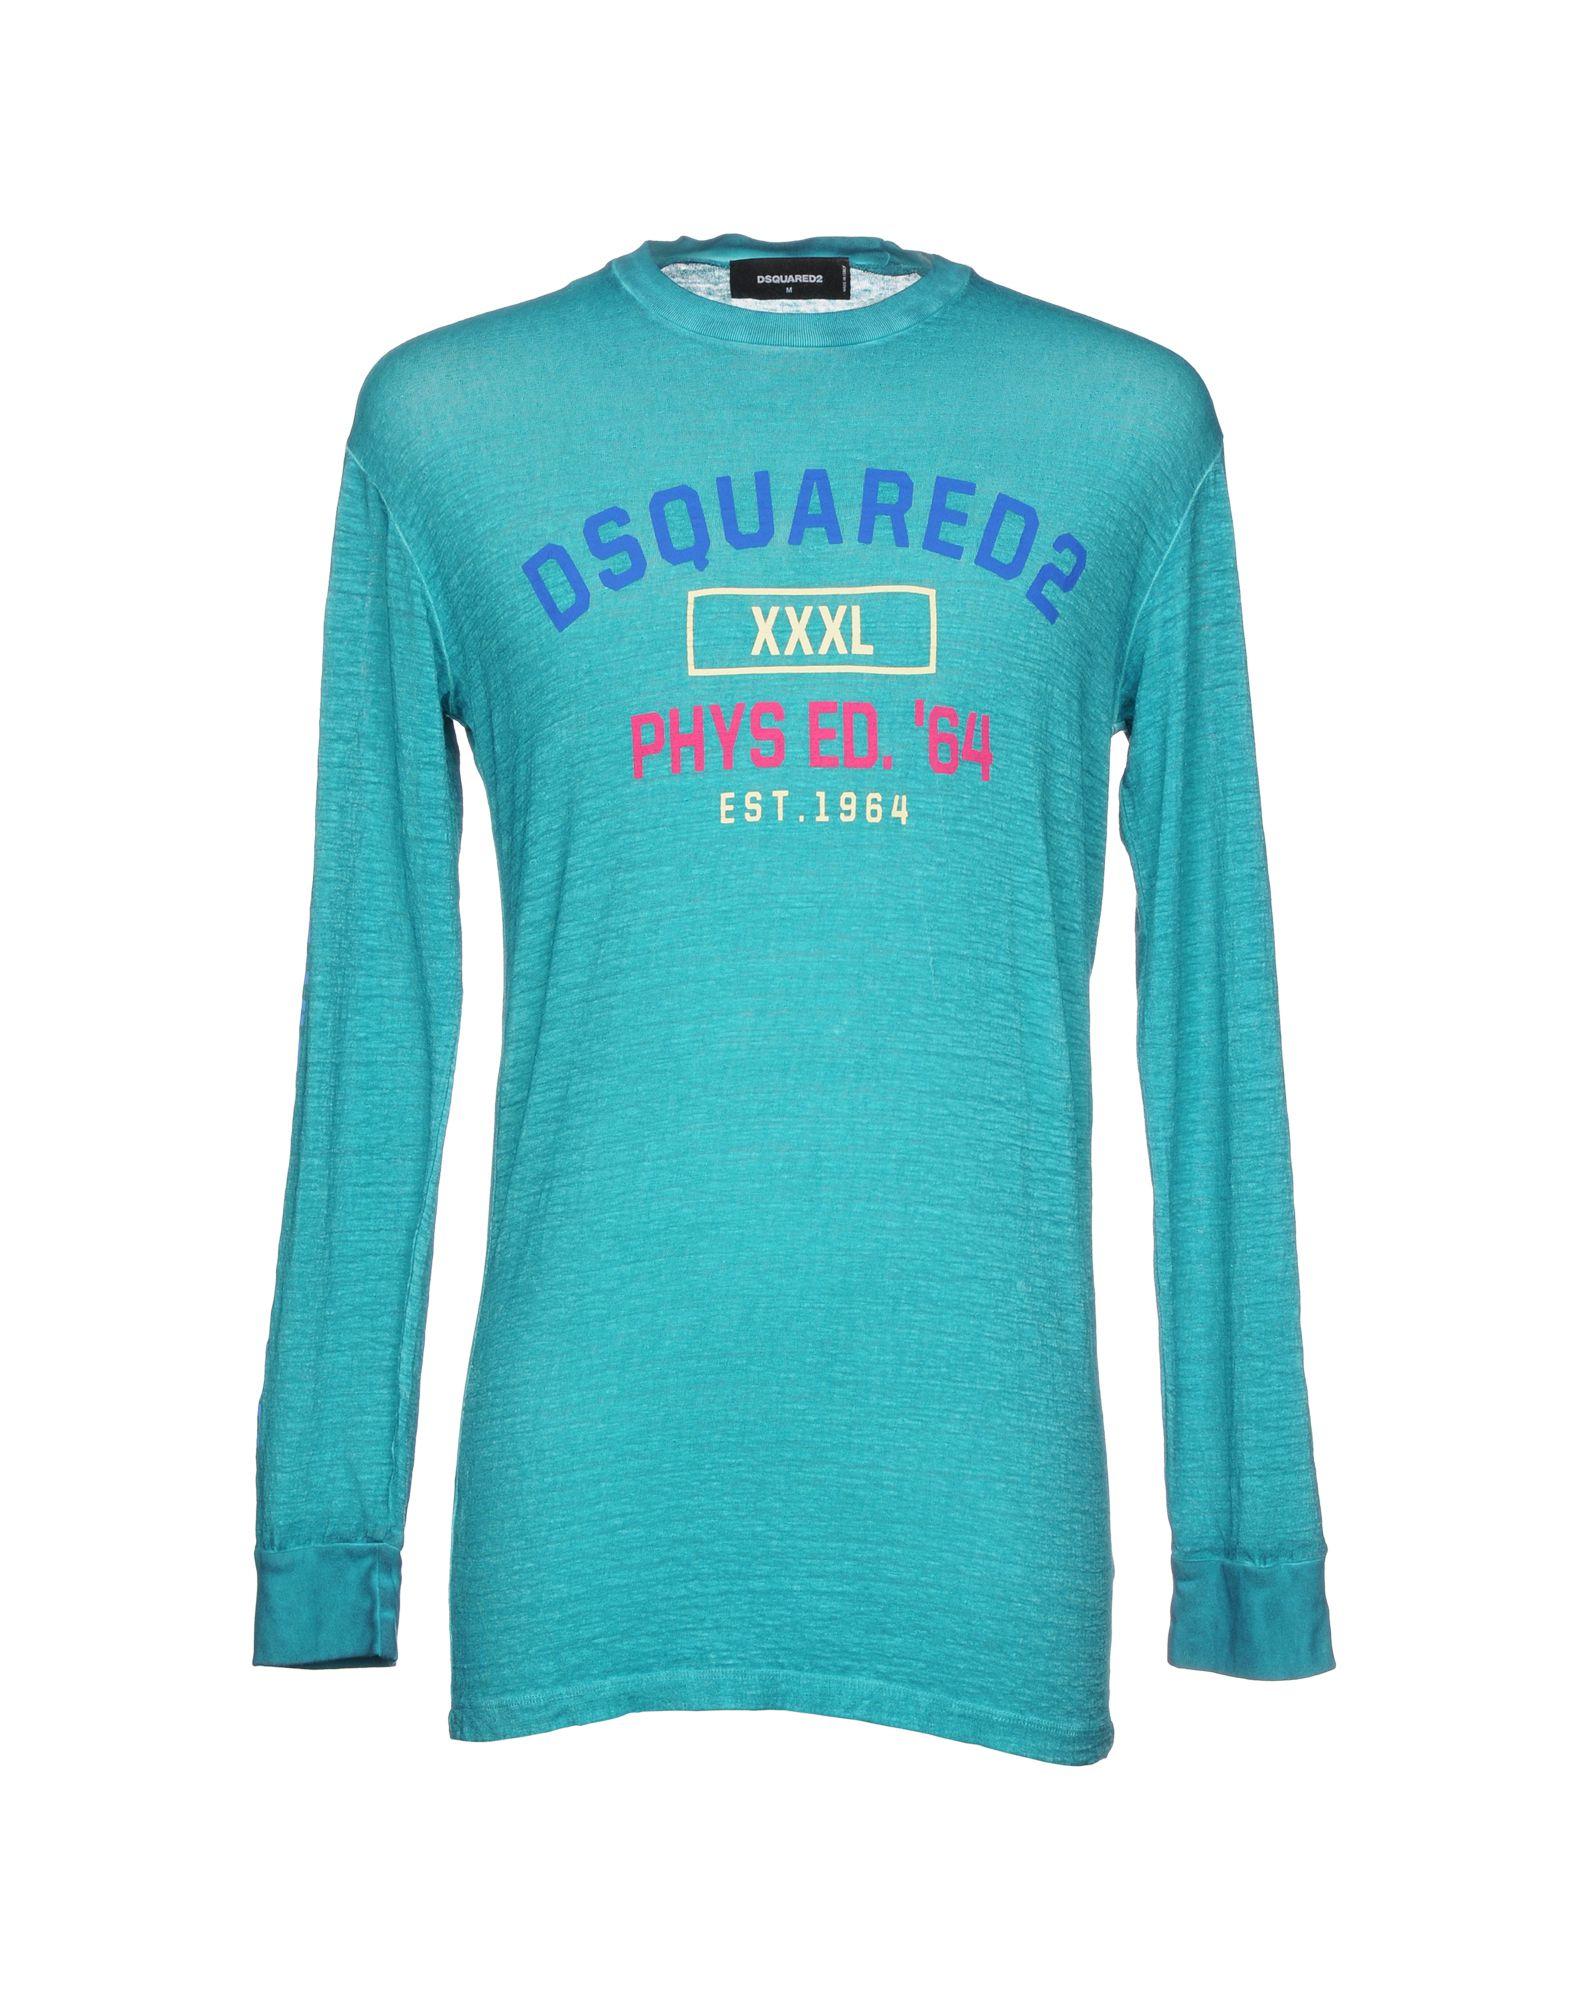 T-Shirt Dsquared2 Uomo - Acquista online su